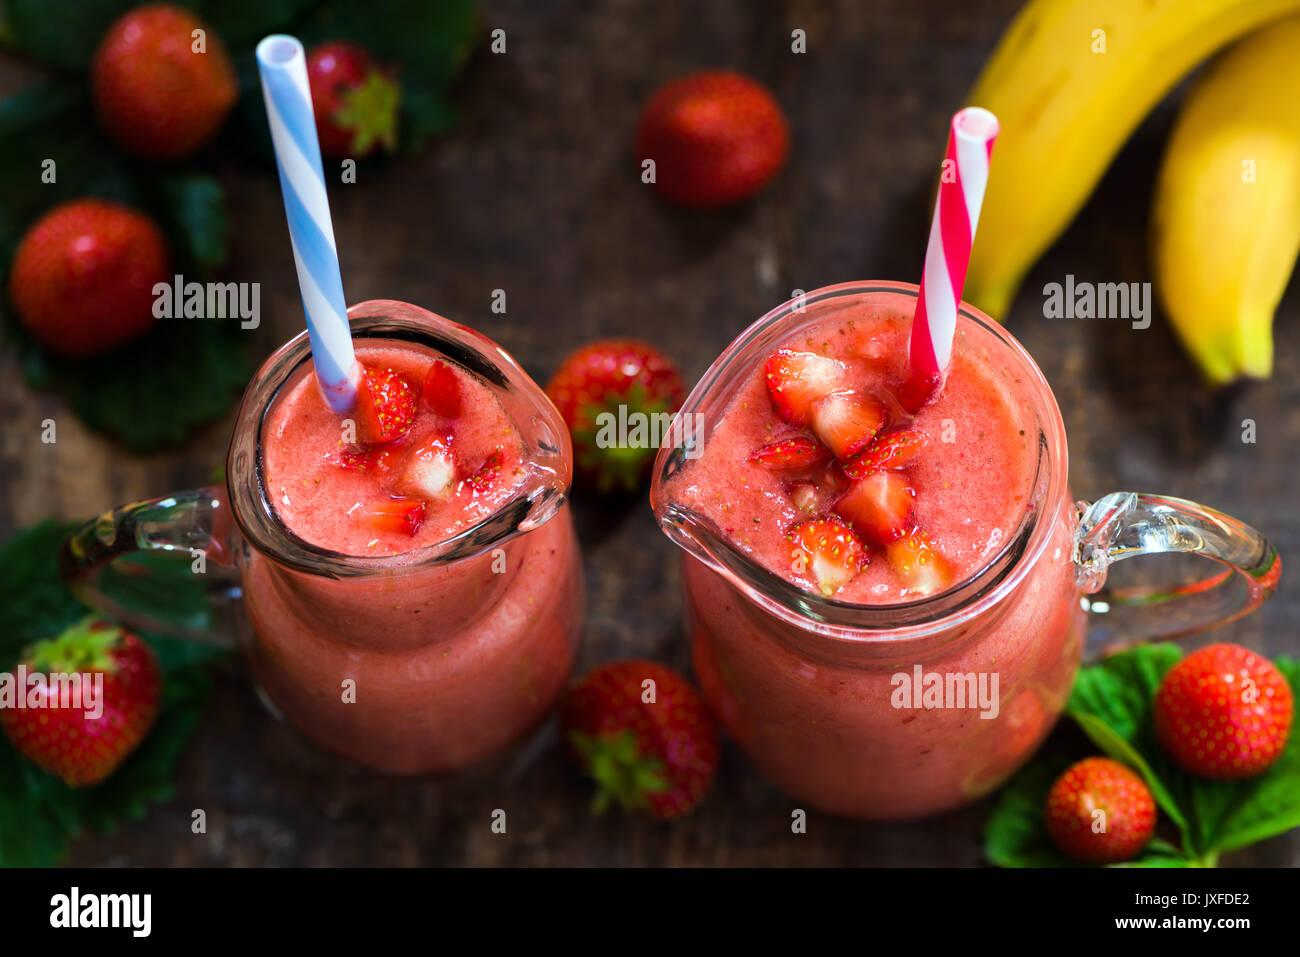 Fresh strawberry and banana smoothie - high angle view - Stock Image